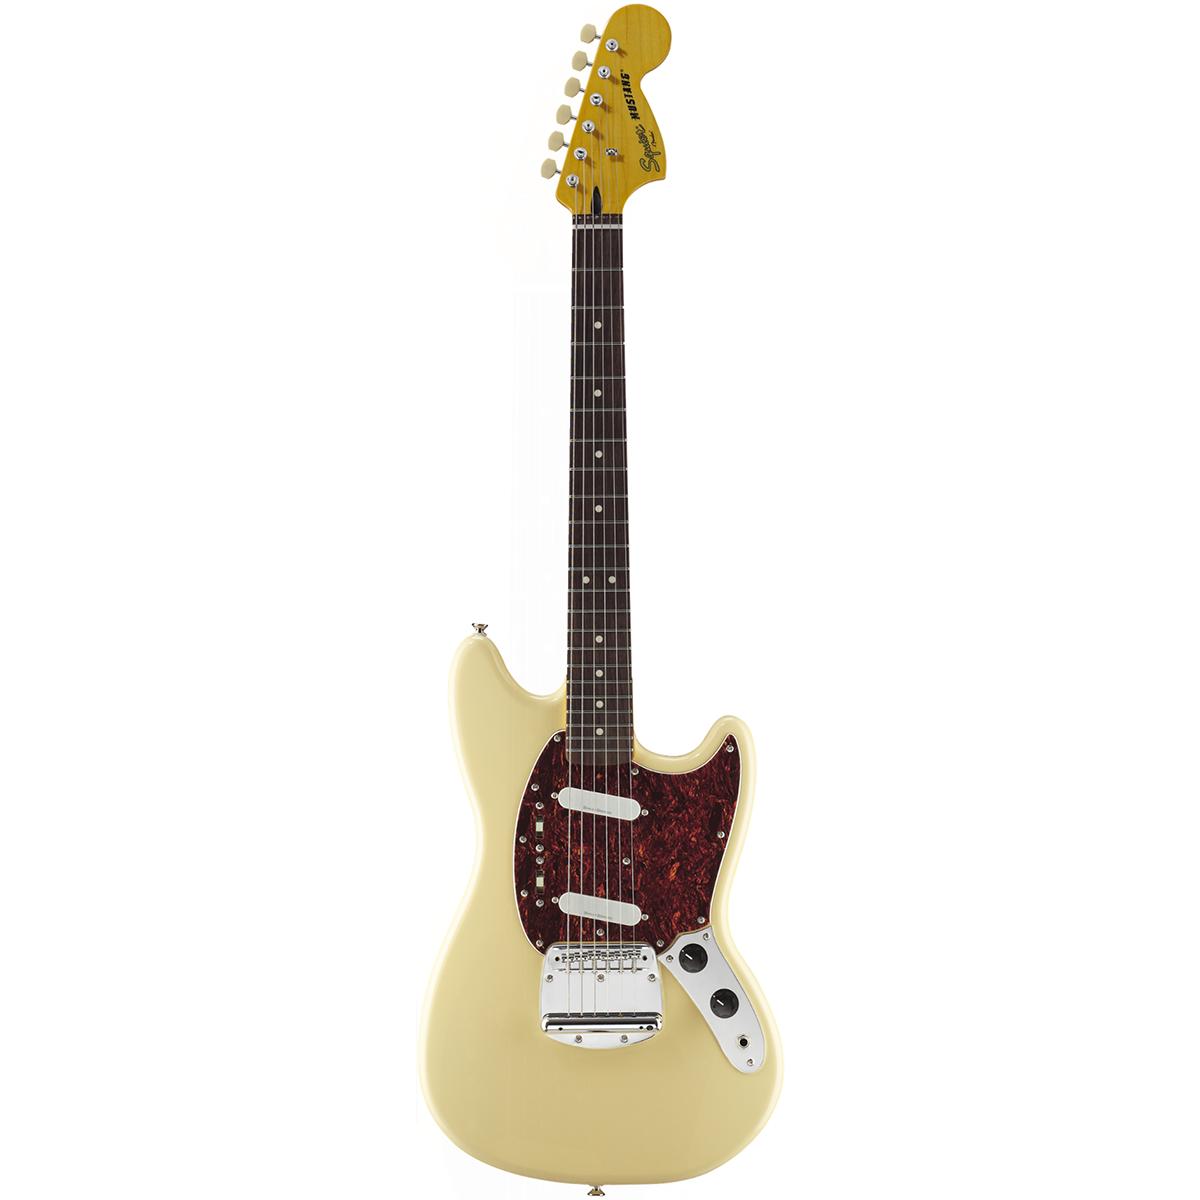 Billede af FenderSquier VintageModifiedMustang,RW,VWT el-guitar vintagewhite